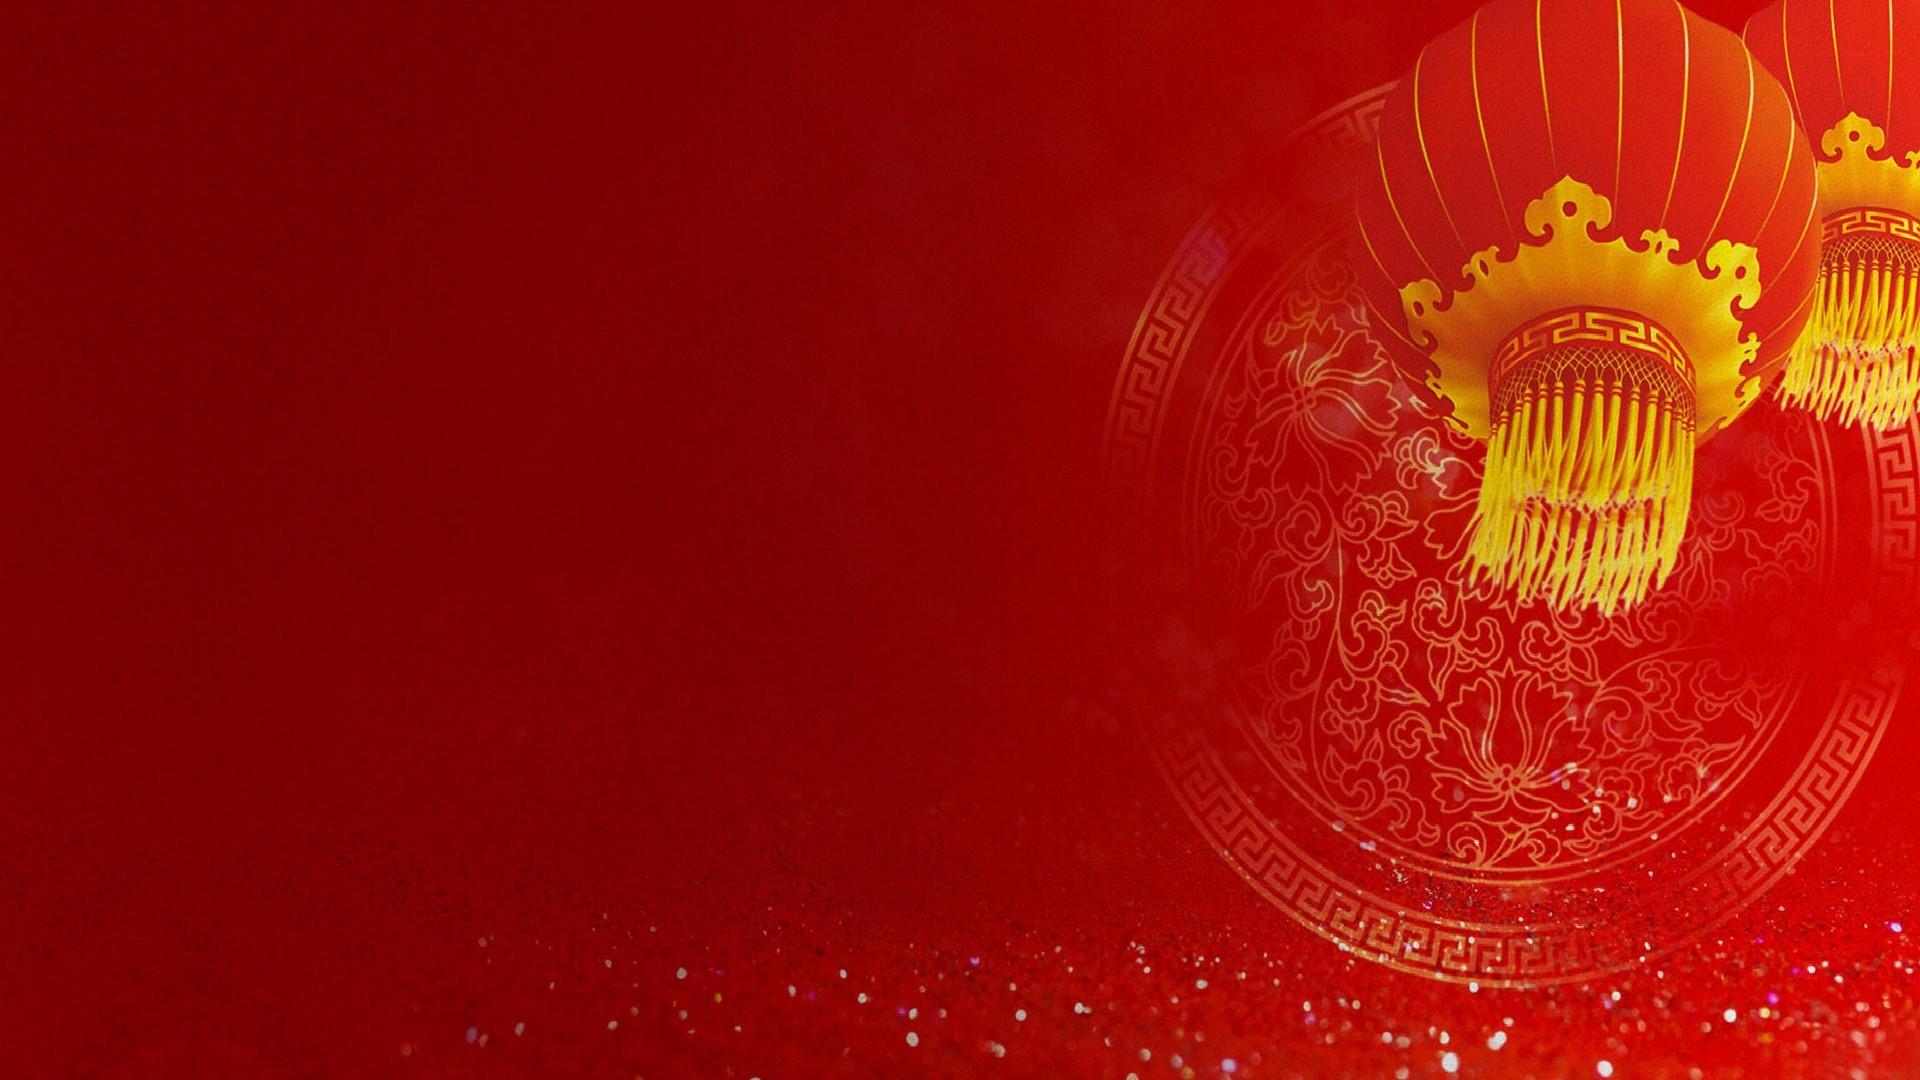 chinese new year wallpaper hd | pixelstalk